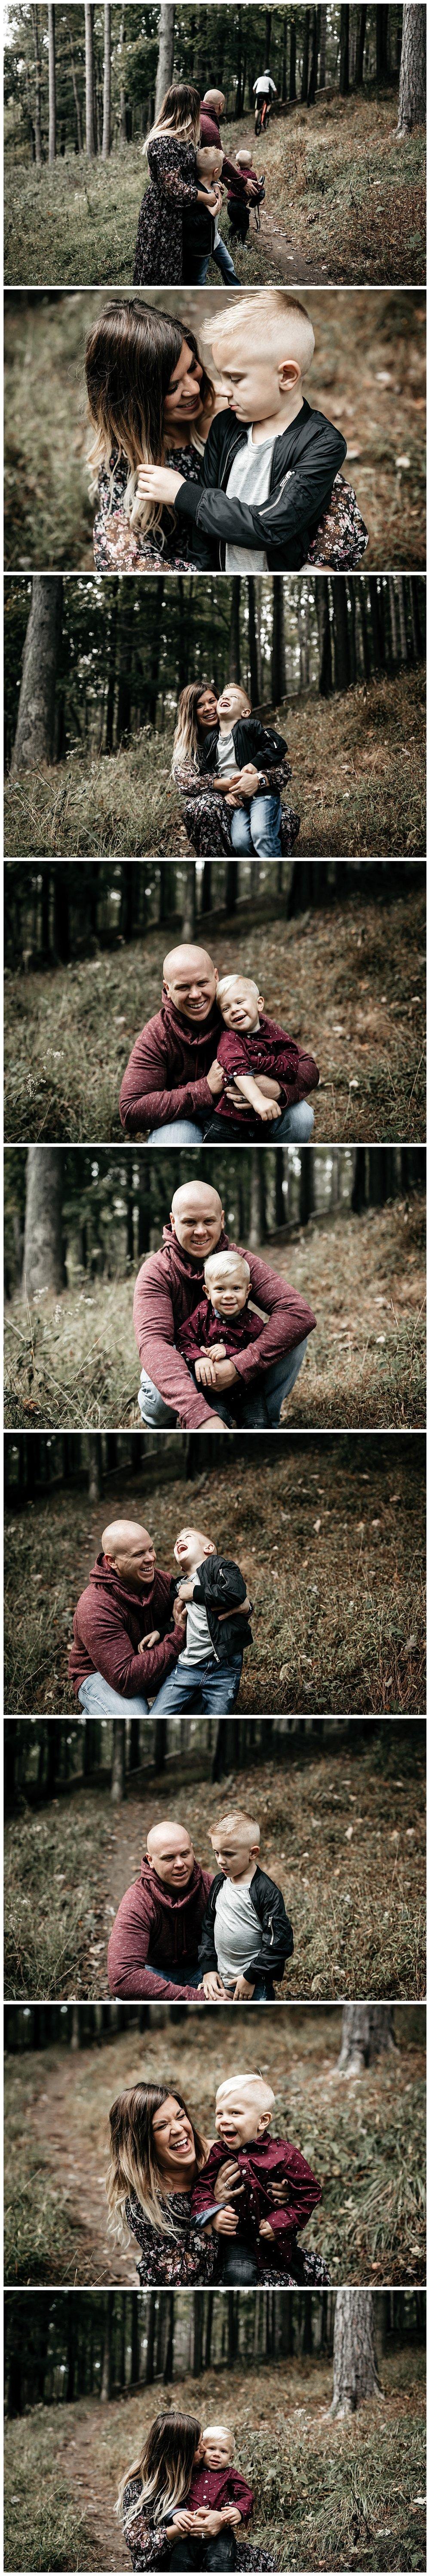 pittsburghfamilyphotographer_0003.jpg